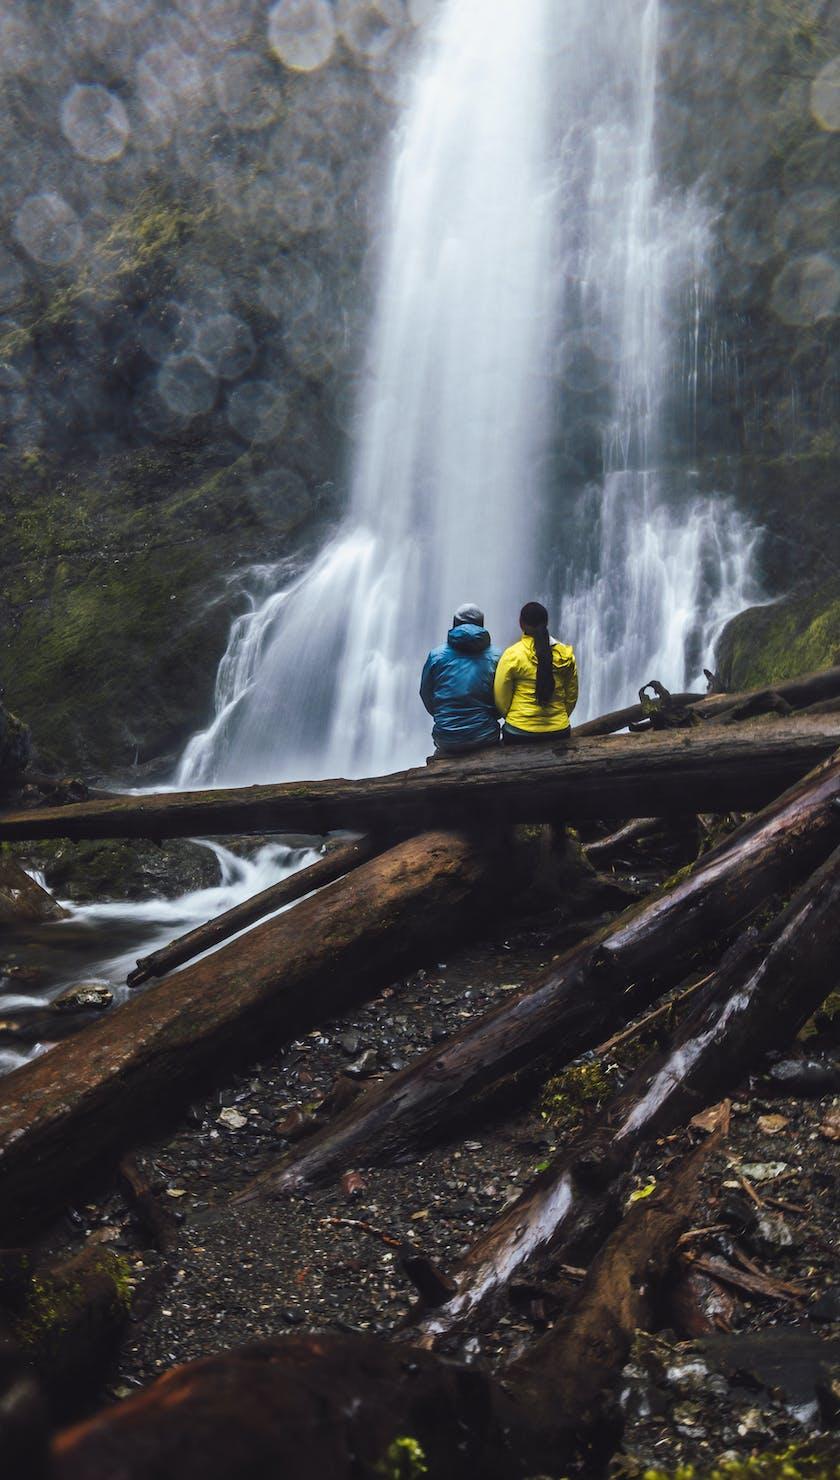 Outdoors enthusiasts testing black diamond rainwear at a waterfall